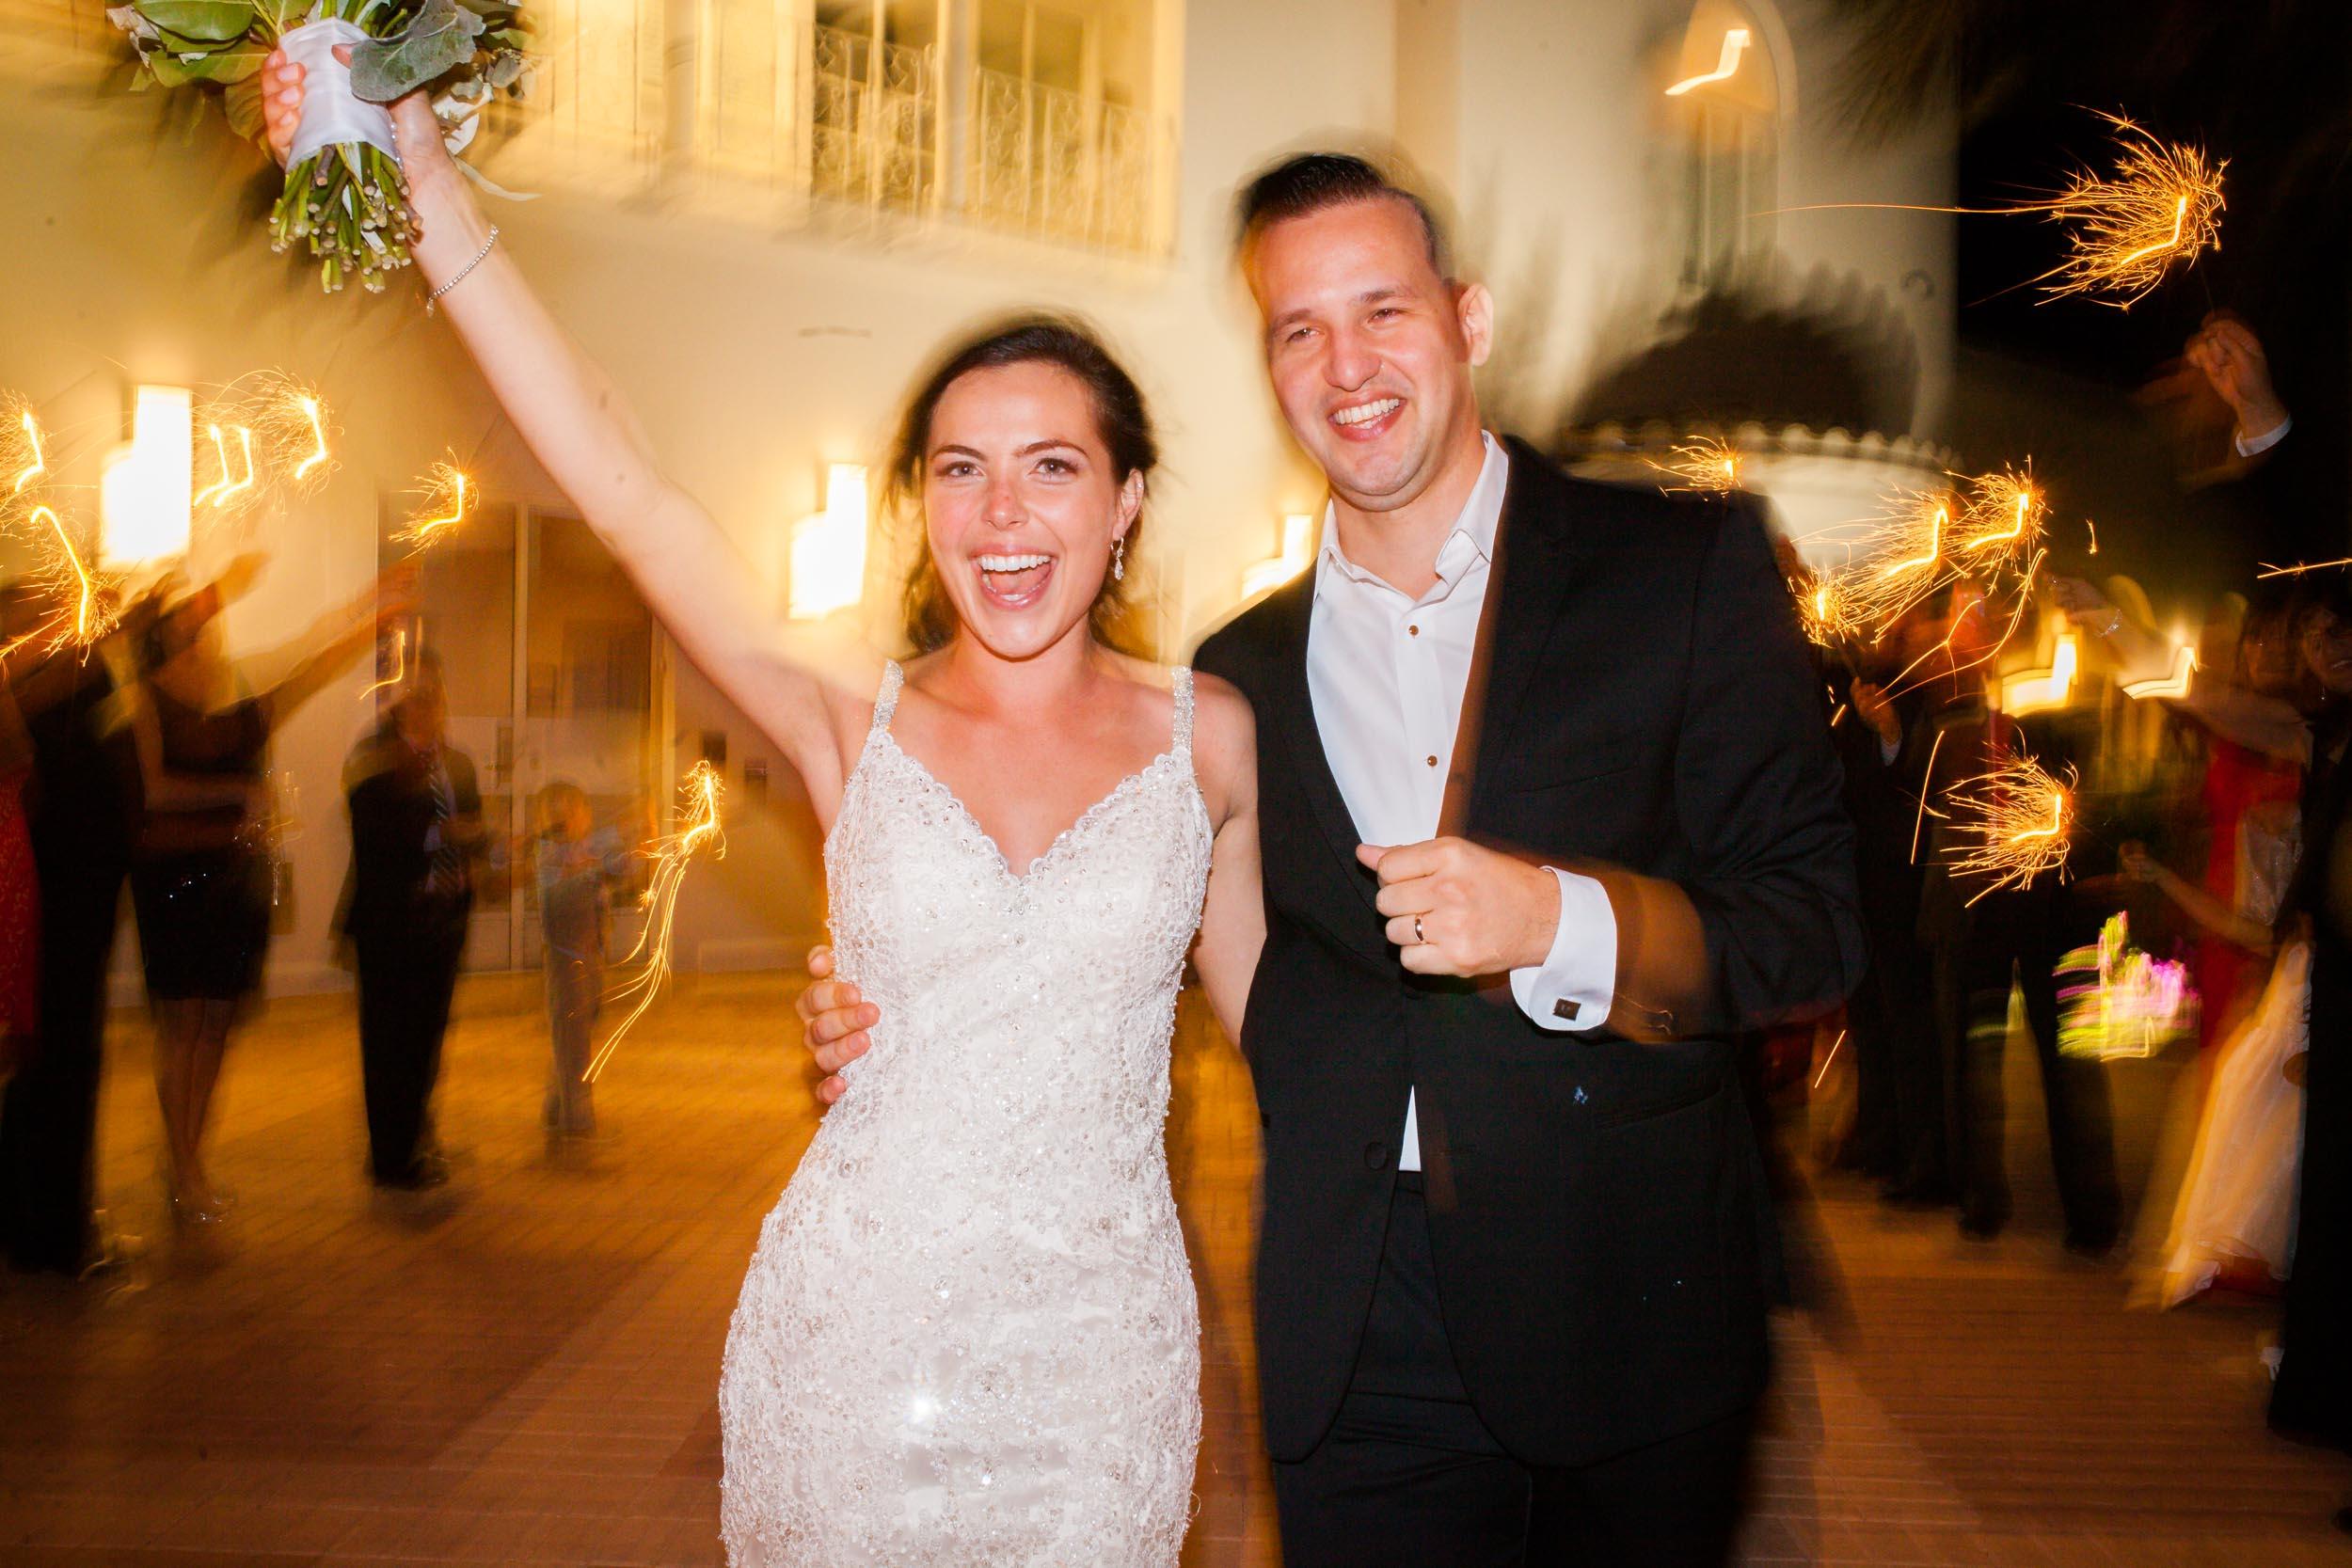 Flordia-Wedding-Photography-87.jpg